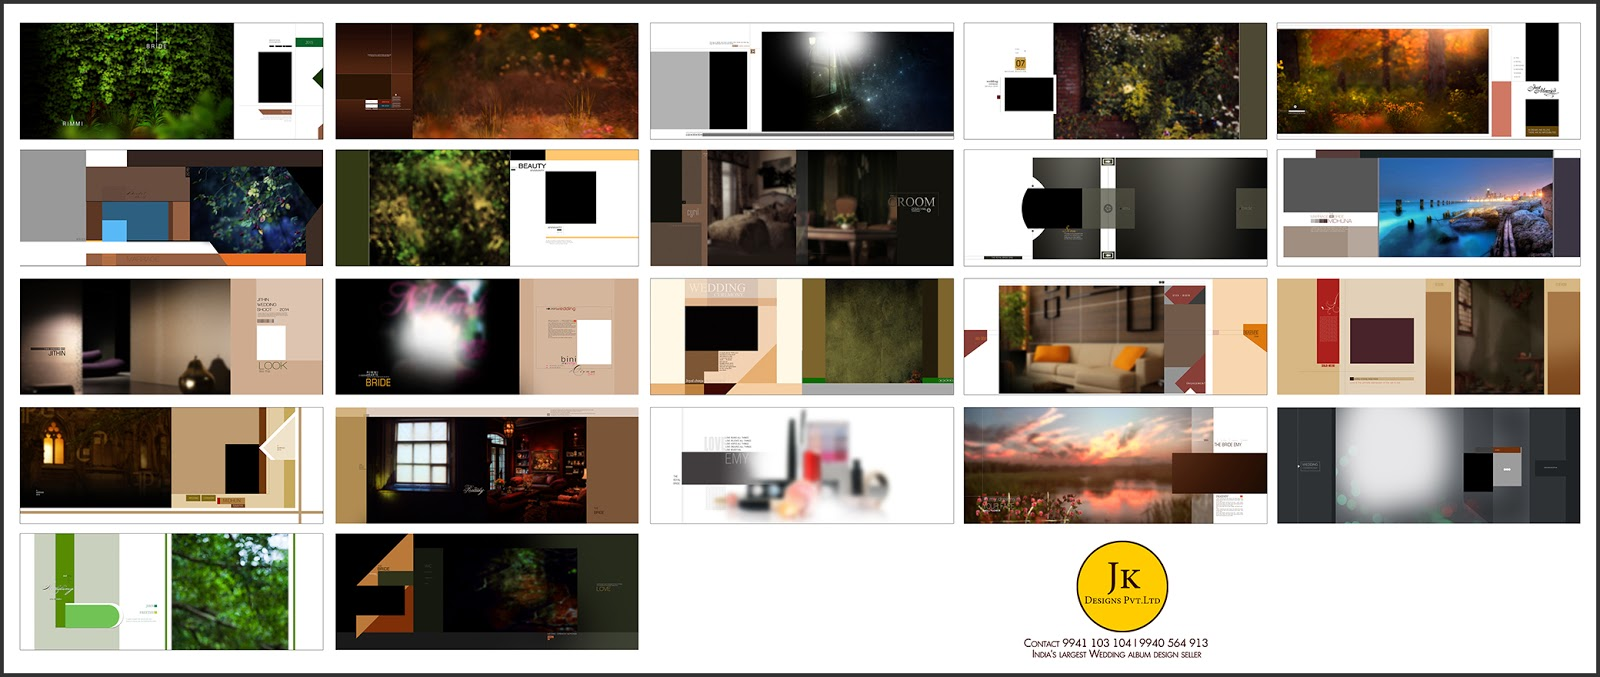 jk designs pvt ltd wedding album hd templates psd format 15 dvd s